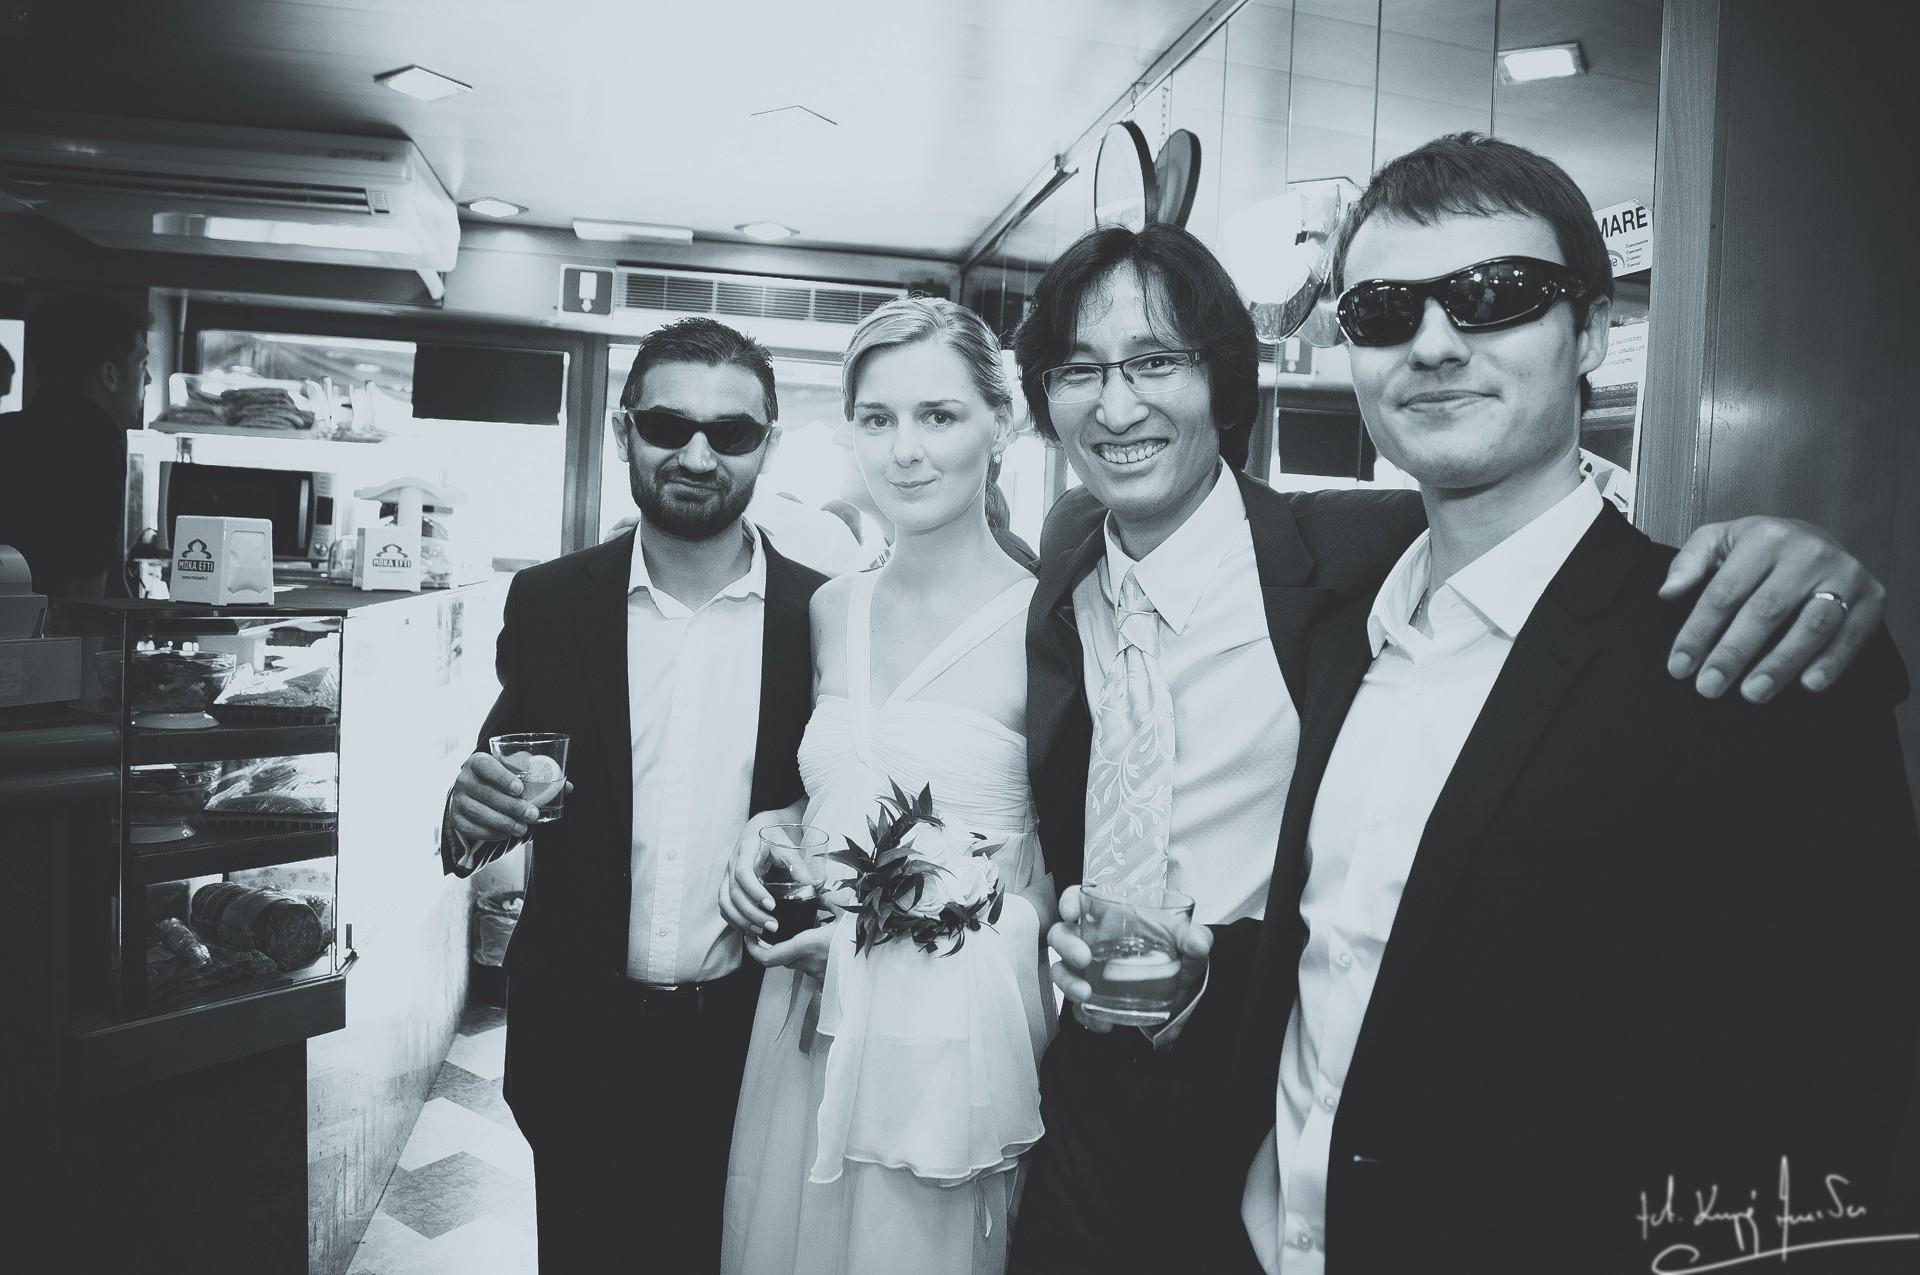 Ślub w wenecji 51 Manuela Luiza & Young Seon Song